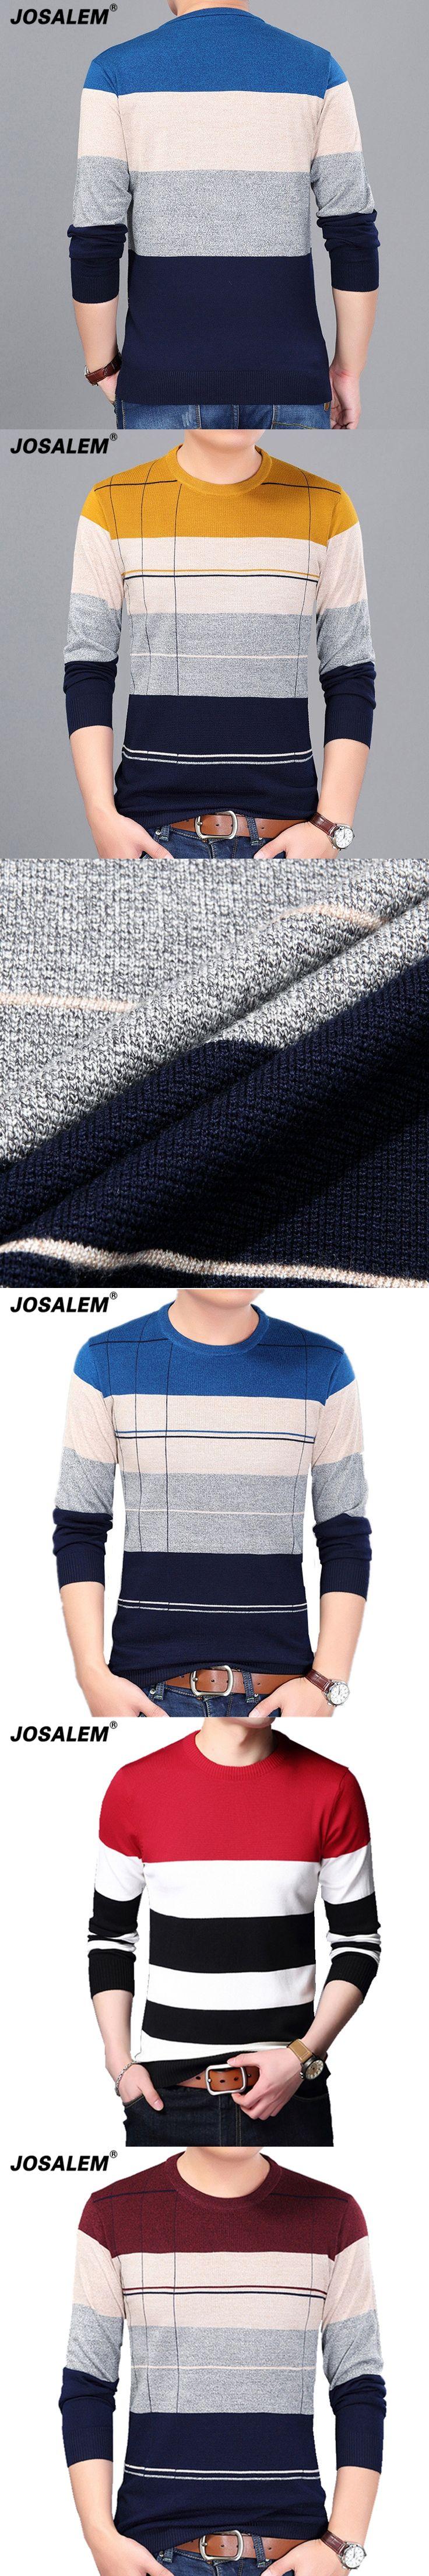 JOSALEM Men Striped Sweater 2017 Autumn Fashion Man Sweater Casual O-neck Slim Fit Knitting Pullovers Men's Sweater Knitwear